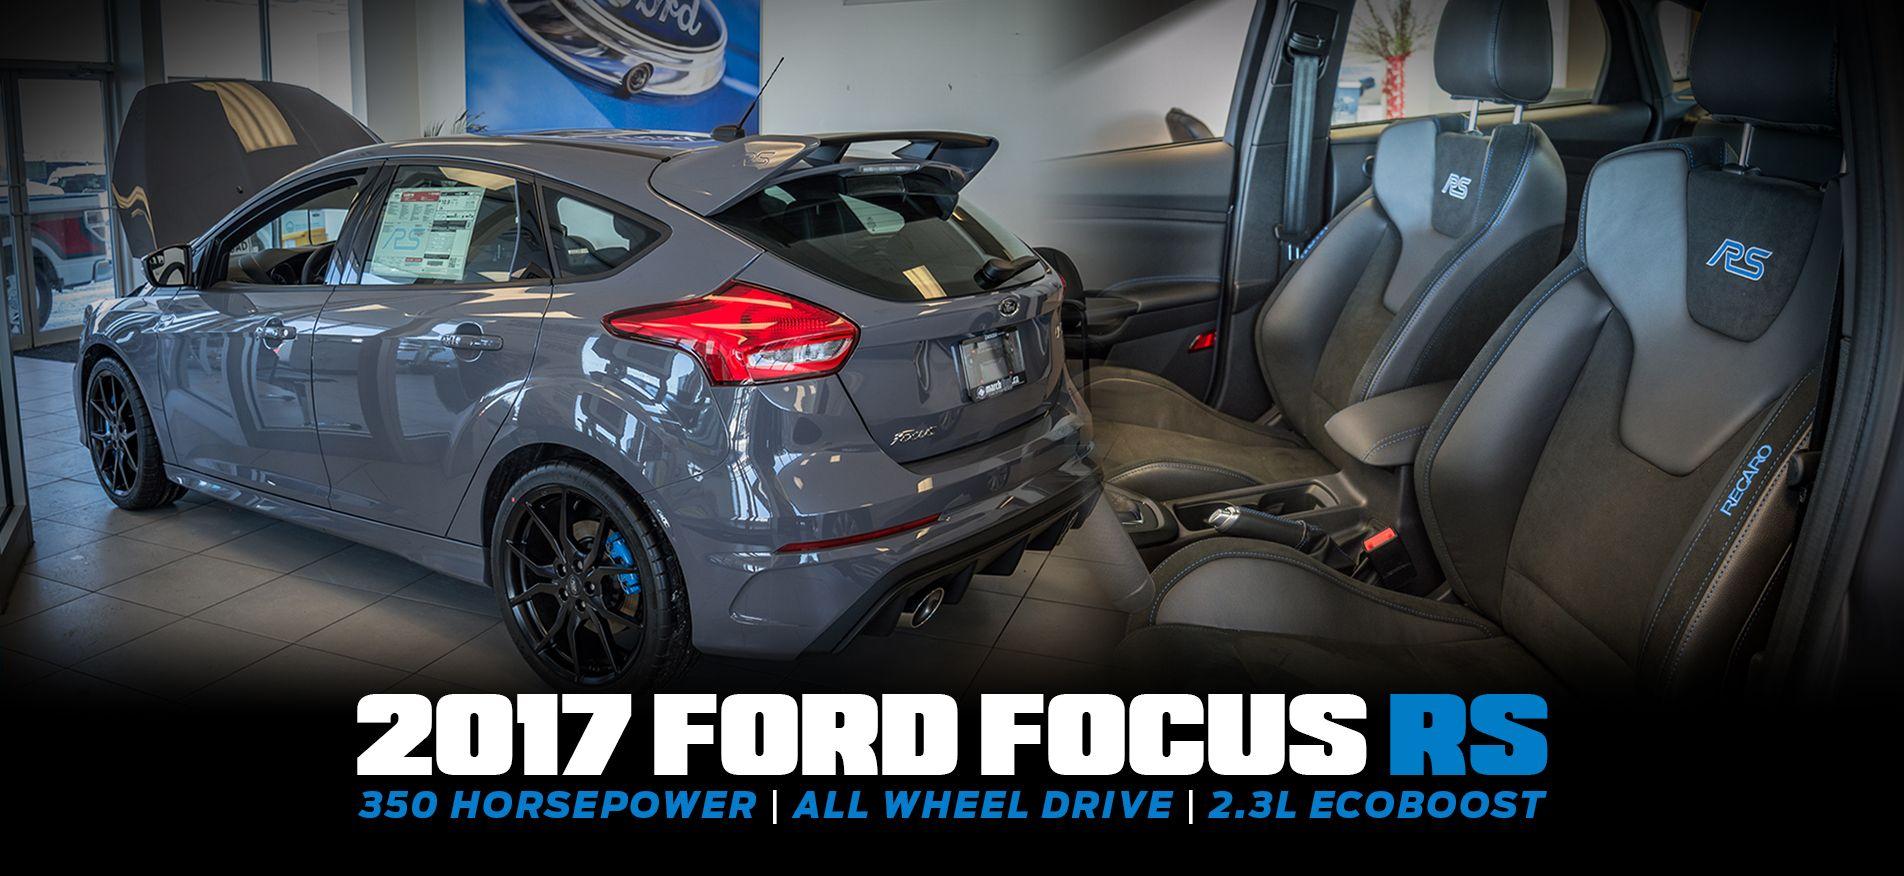 ford focus rs ottawa 2017 2016